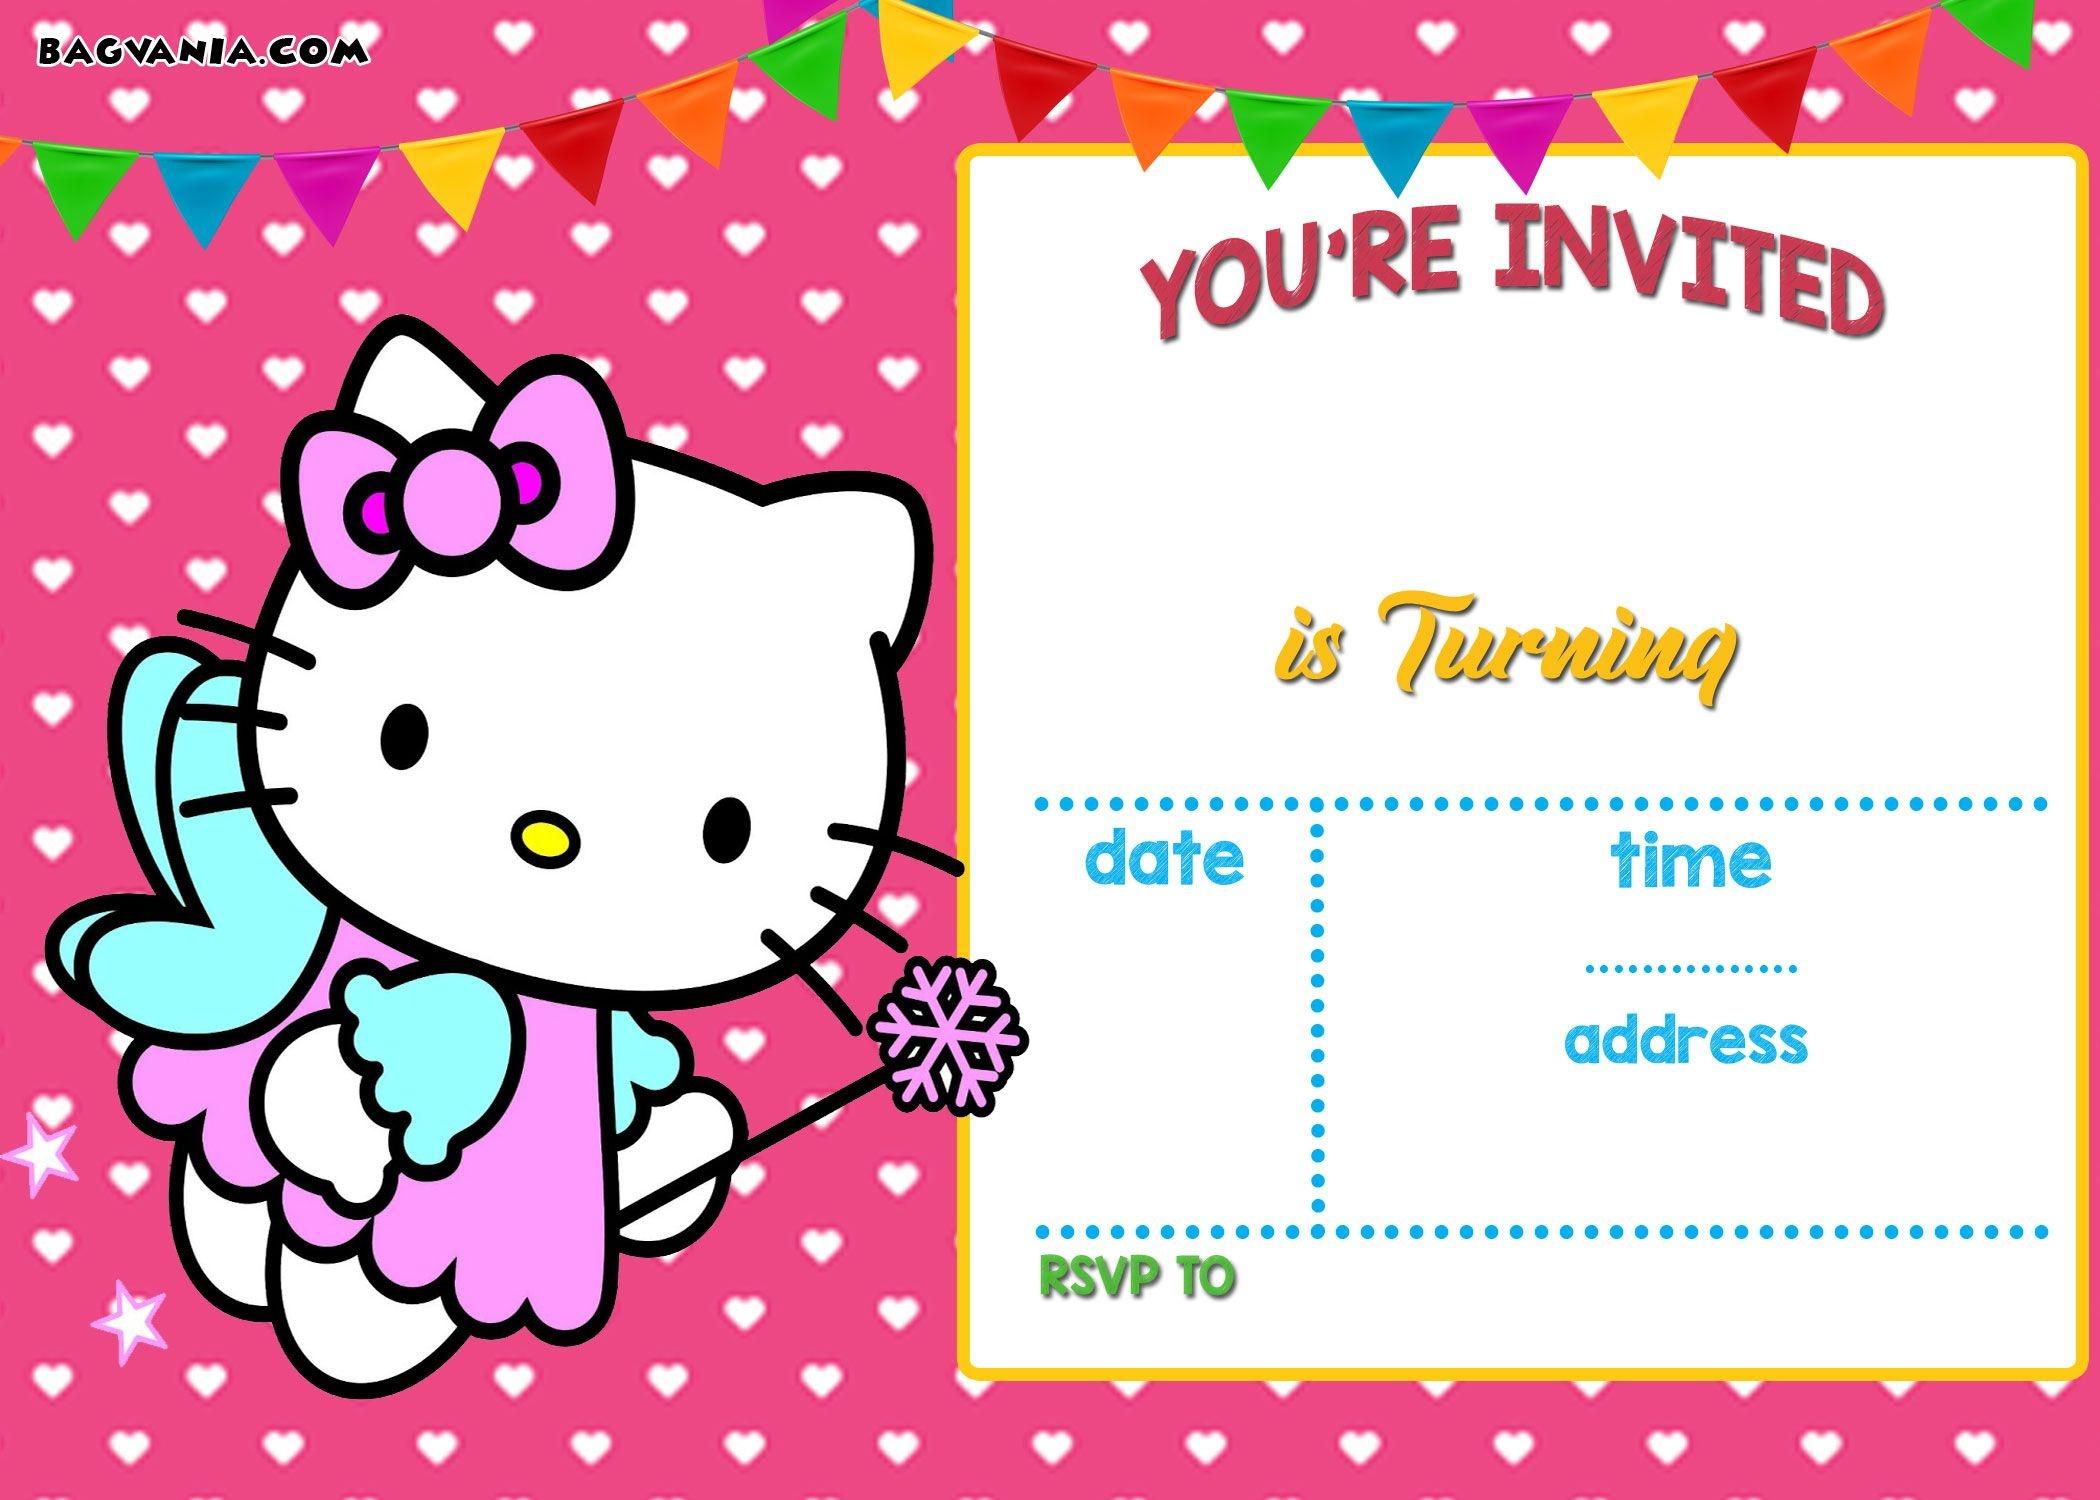 Free Hello Kitty Invitation Templates | Free Printable Birthday - Make Printable Party Invitations Online Free